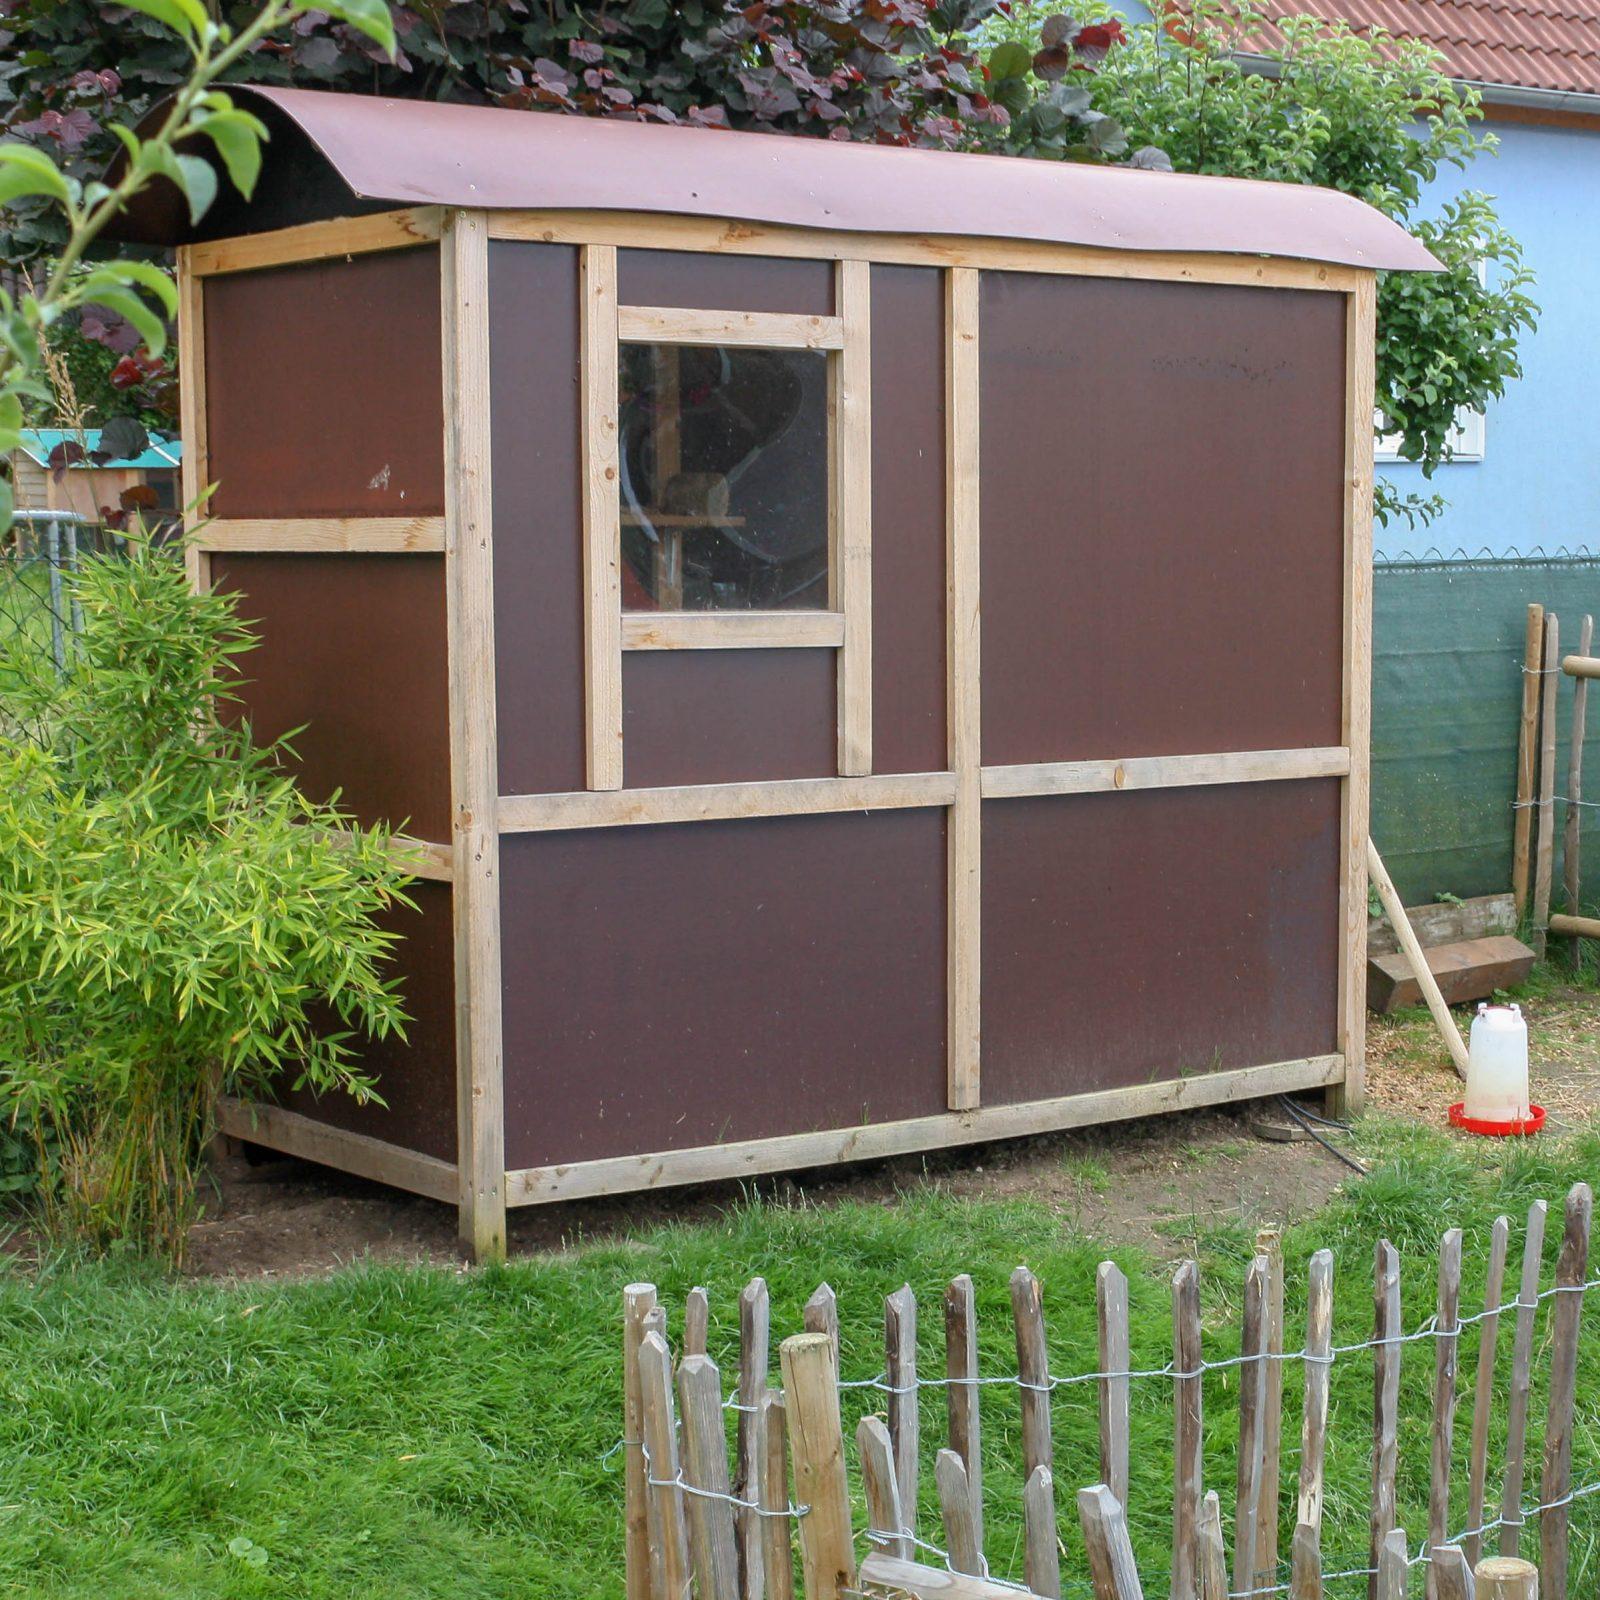 welches fundament f r das gartenhaus native plants gartenblog. Black Bedroom Furniture Sets. Home Design Ideas